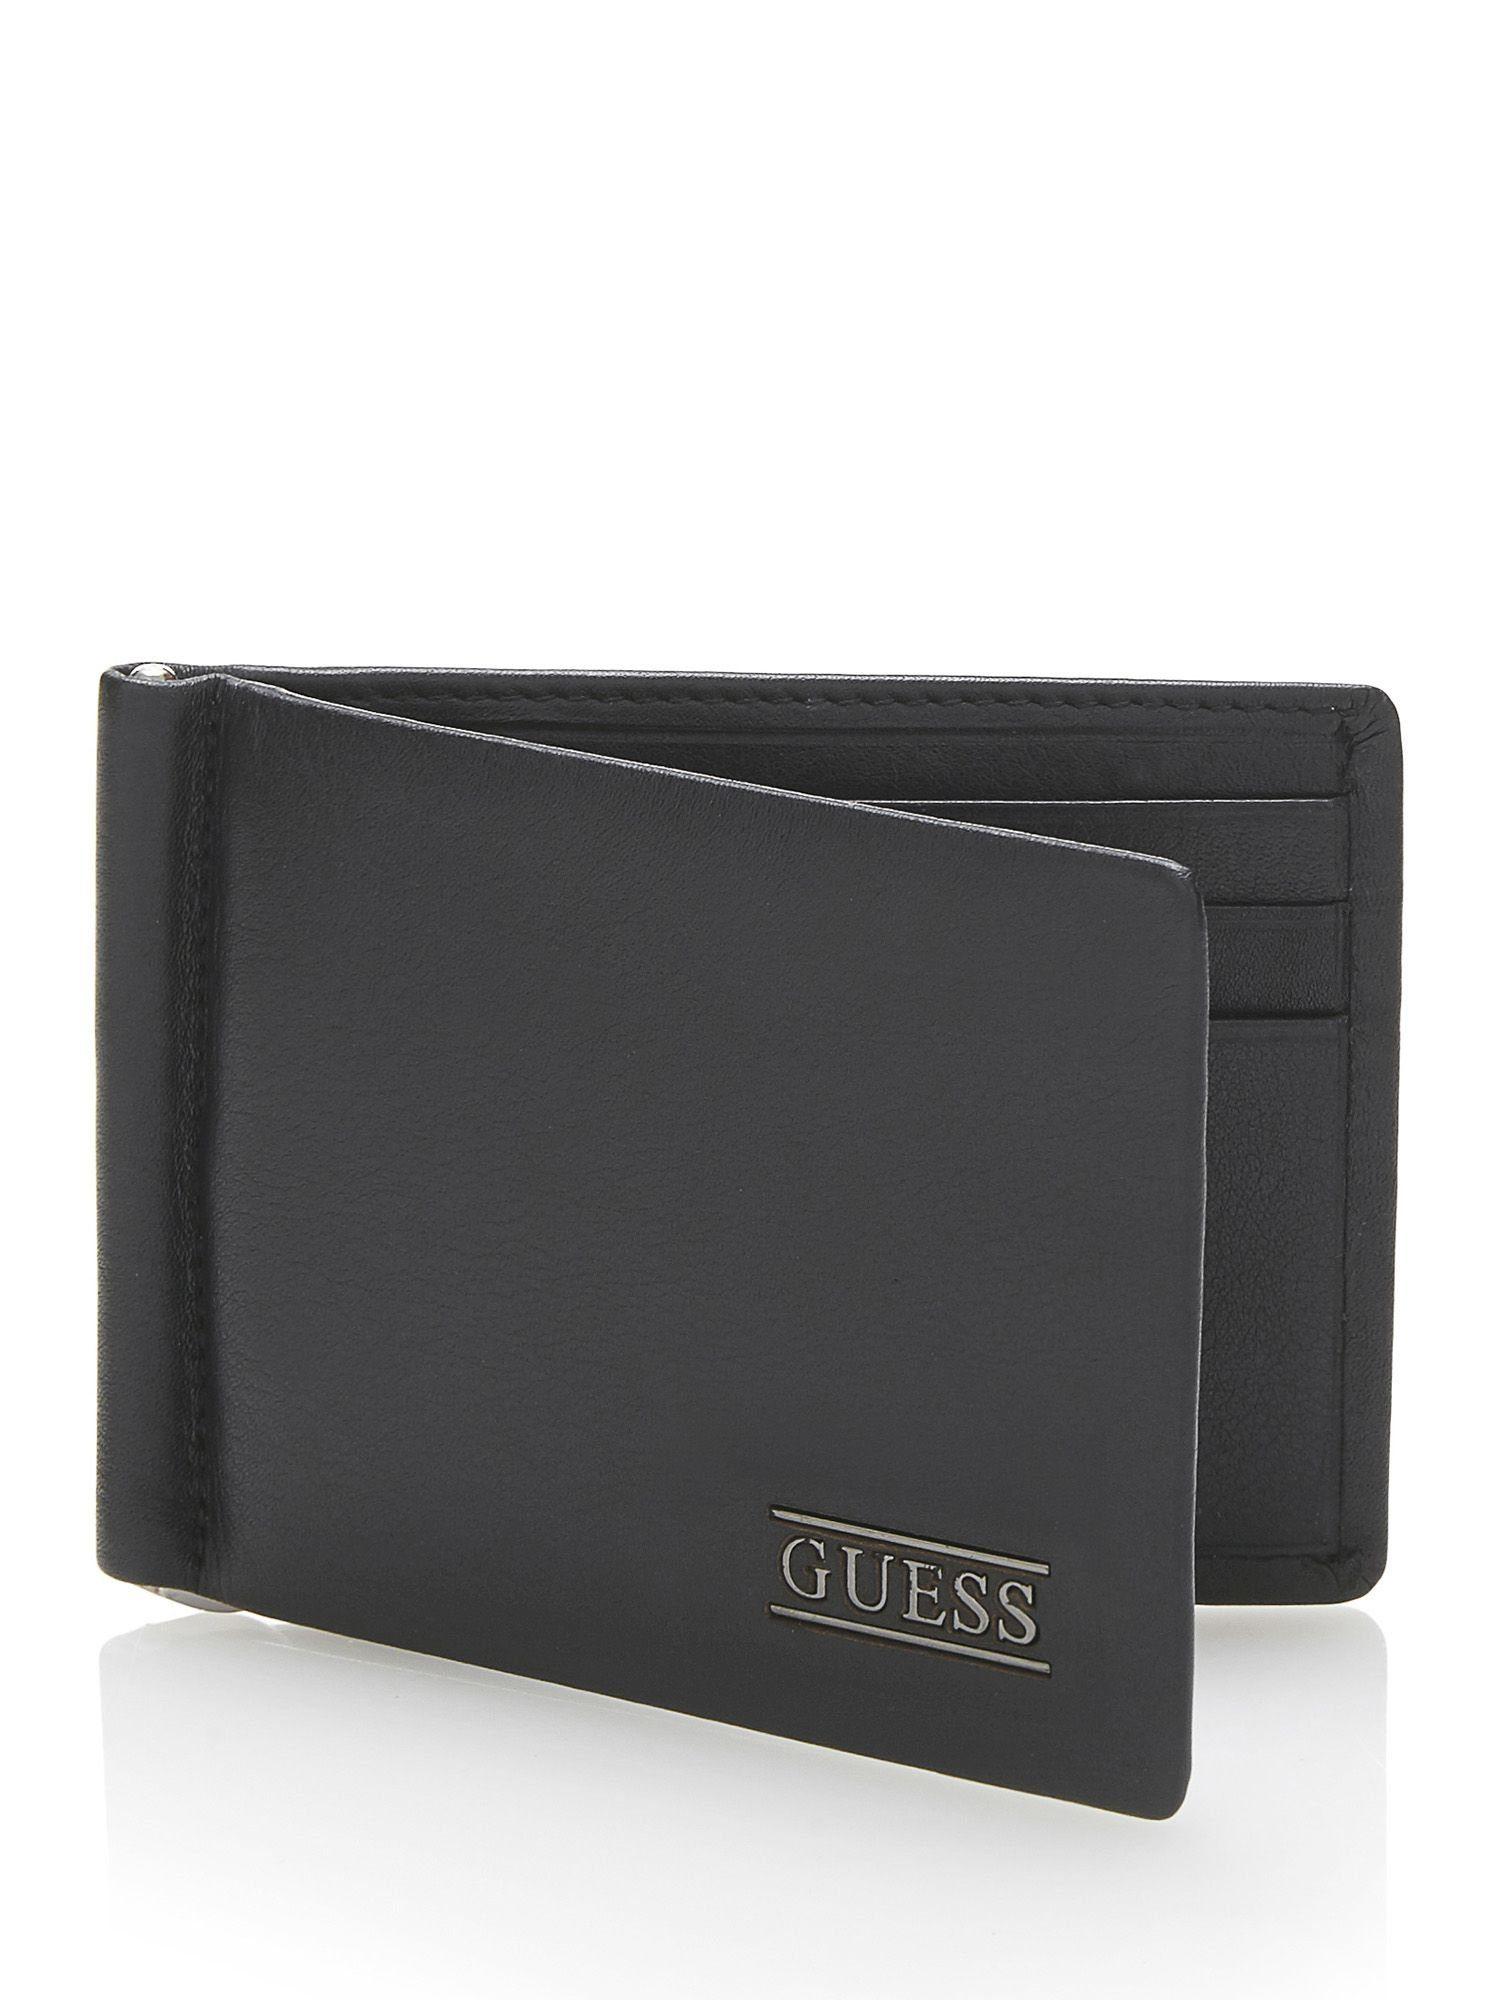 Guess Brieftasche